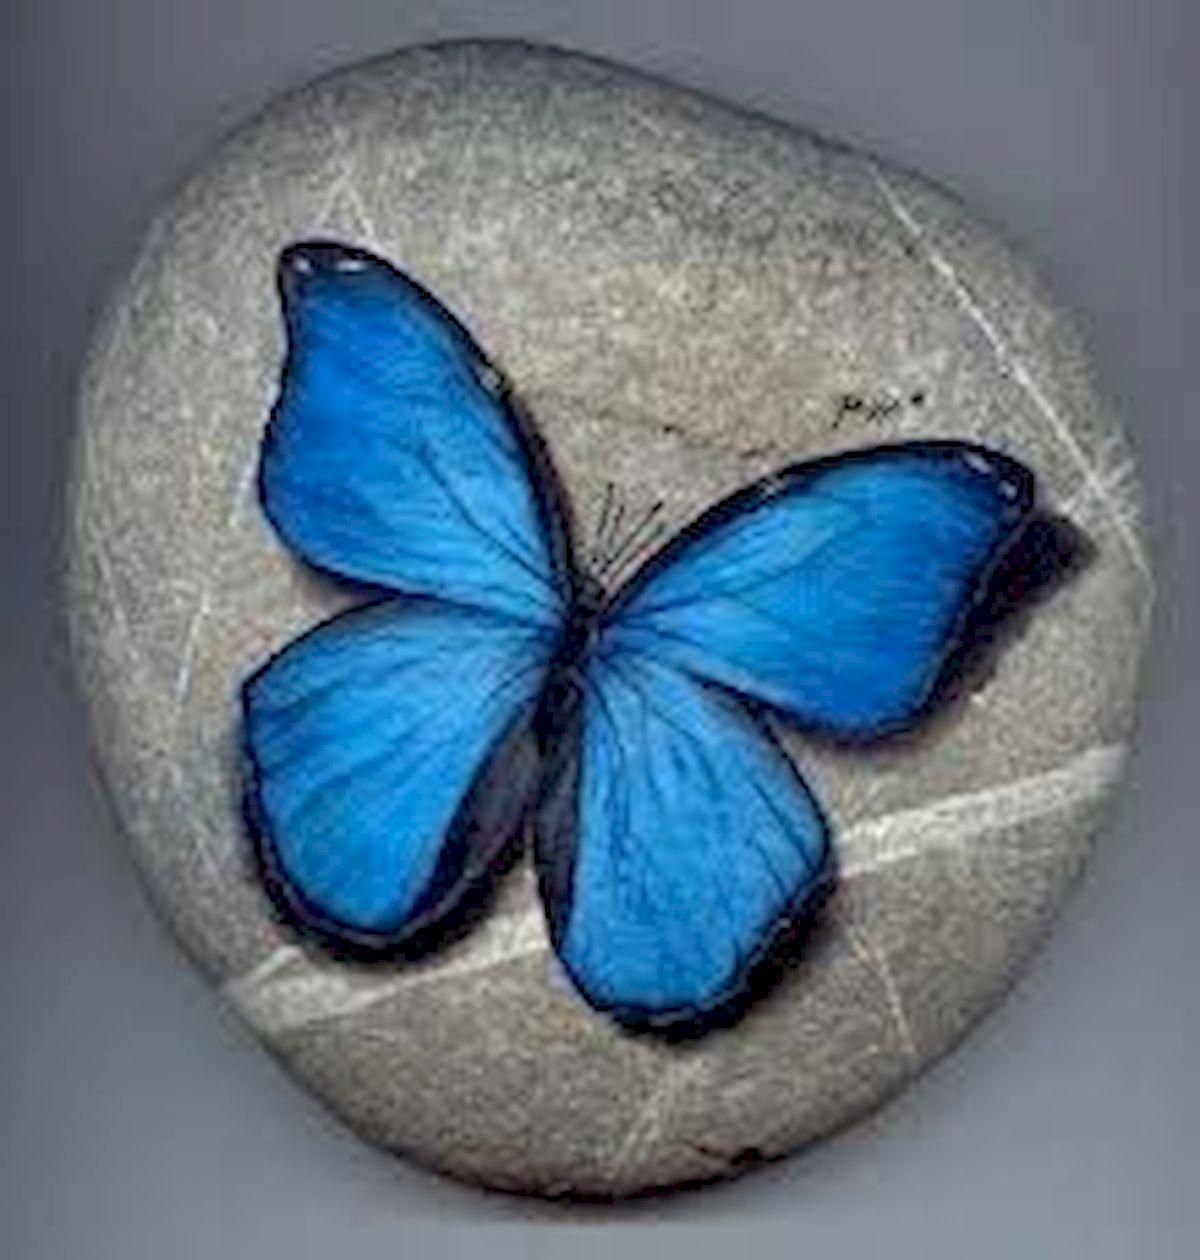 55 Cute DIY Painted Rocks Animals Butterfly Ideas (54)